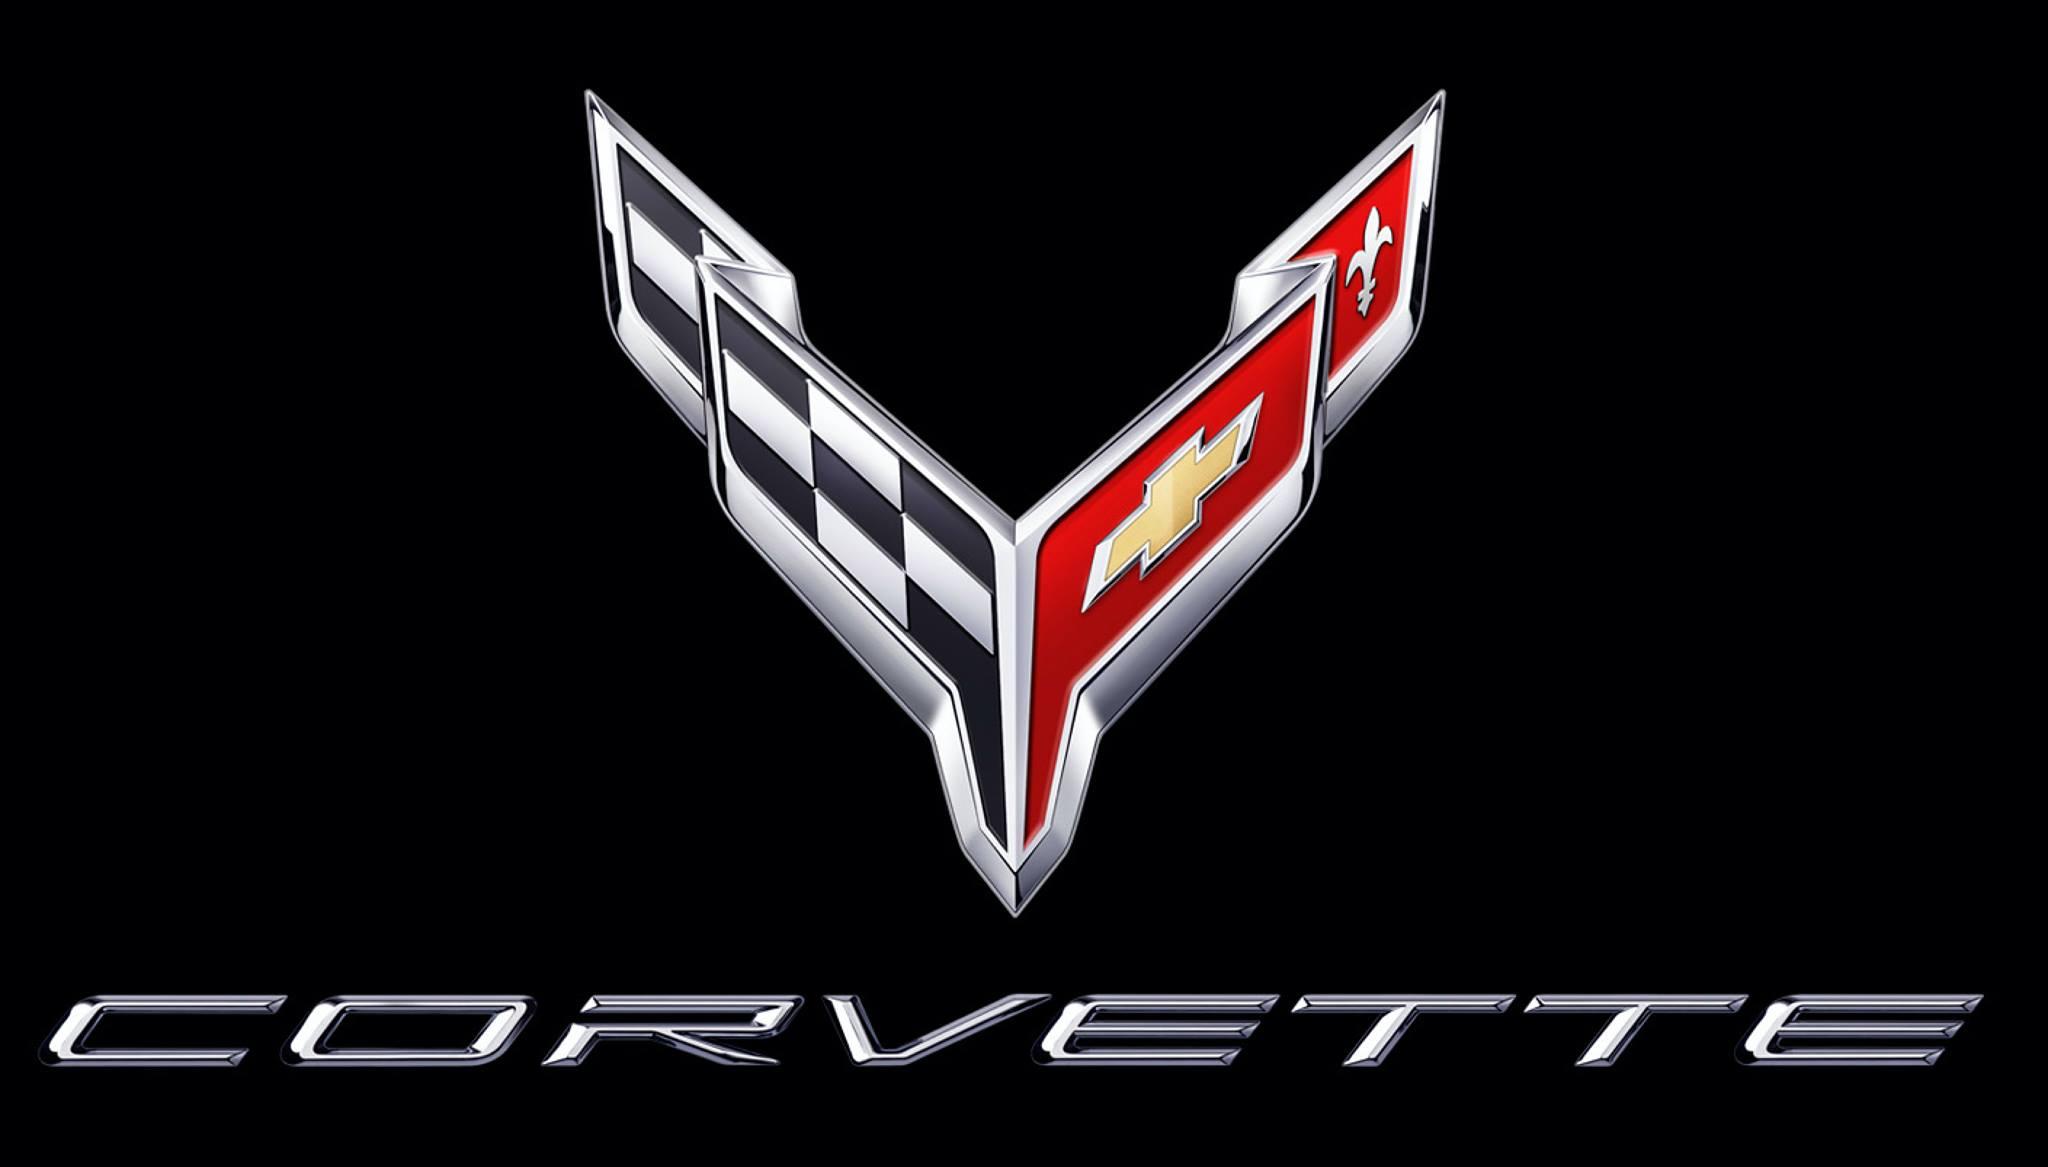 Logo de Chevrolet Corvette bandera